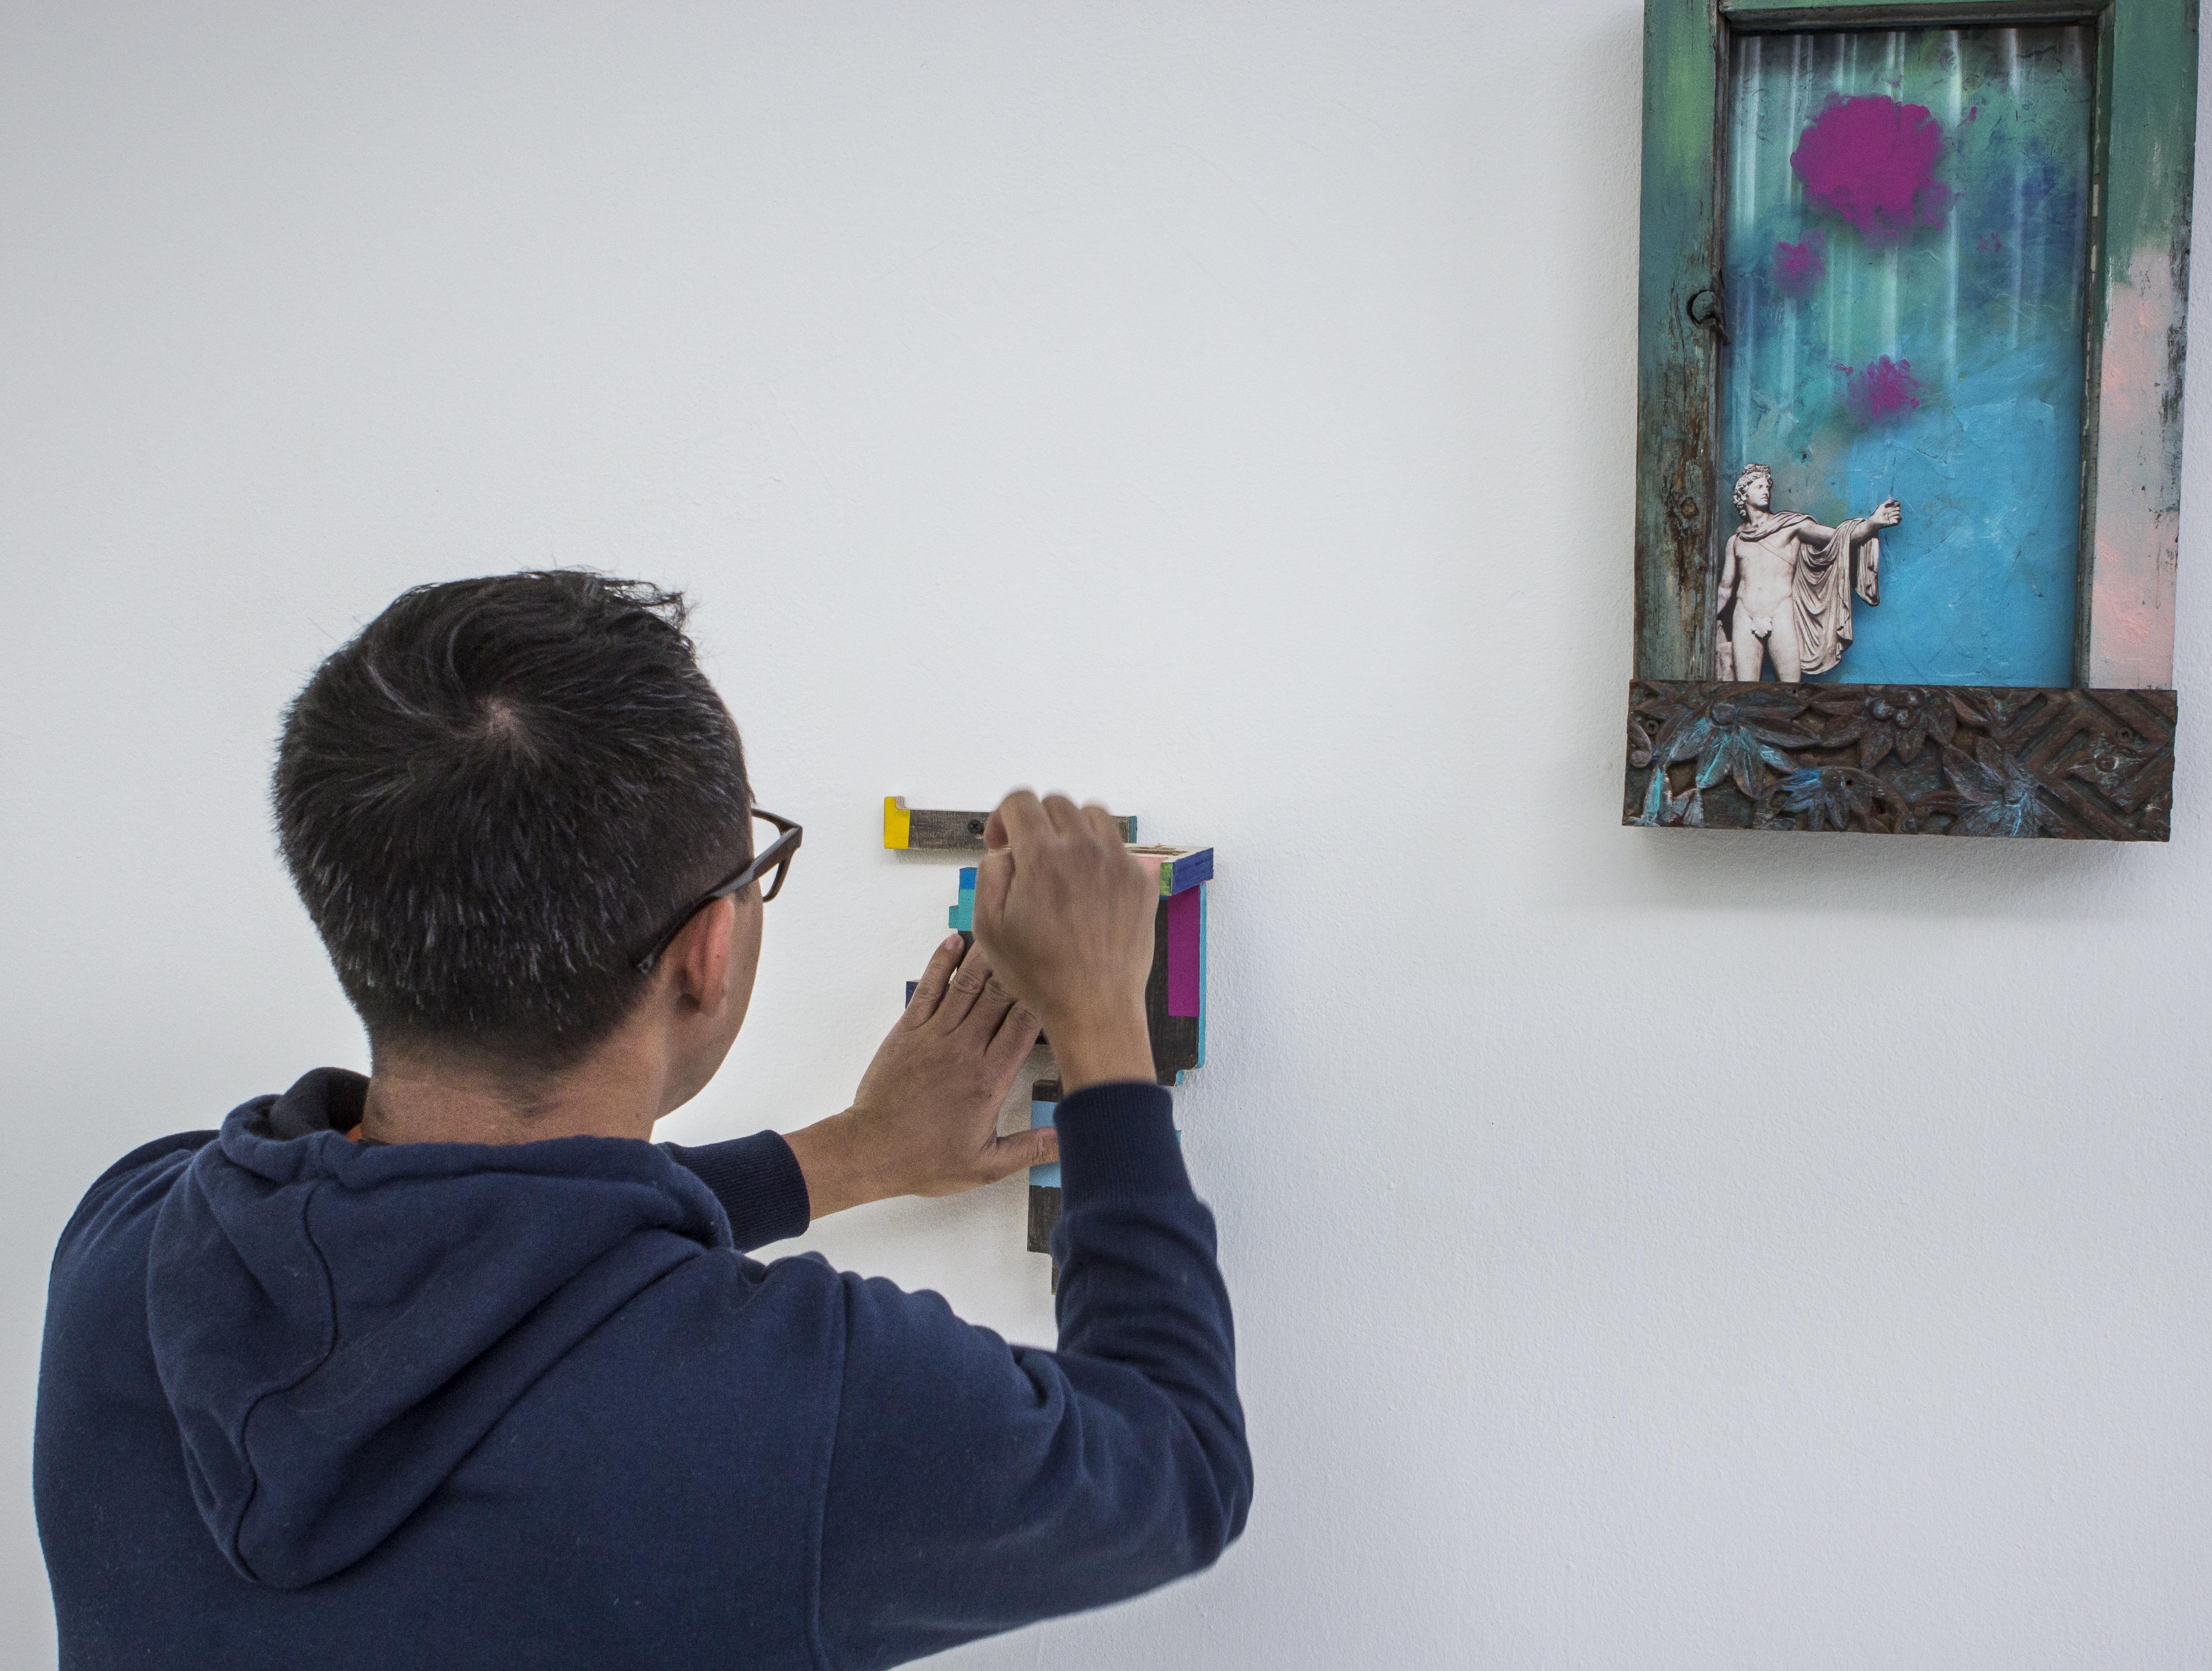 Aji Bayuaji at KunsthalLight16 Image by Marcel Kollen